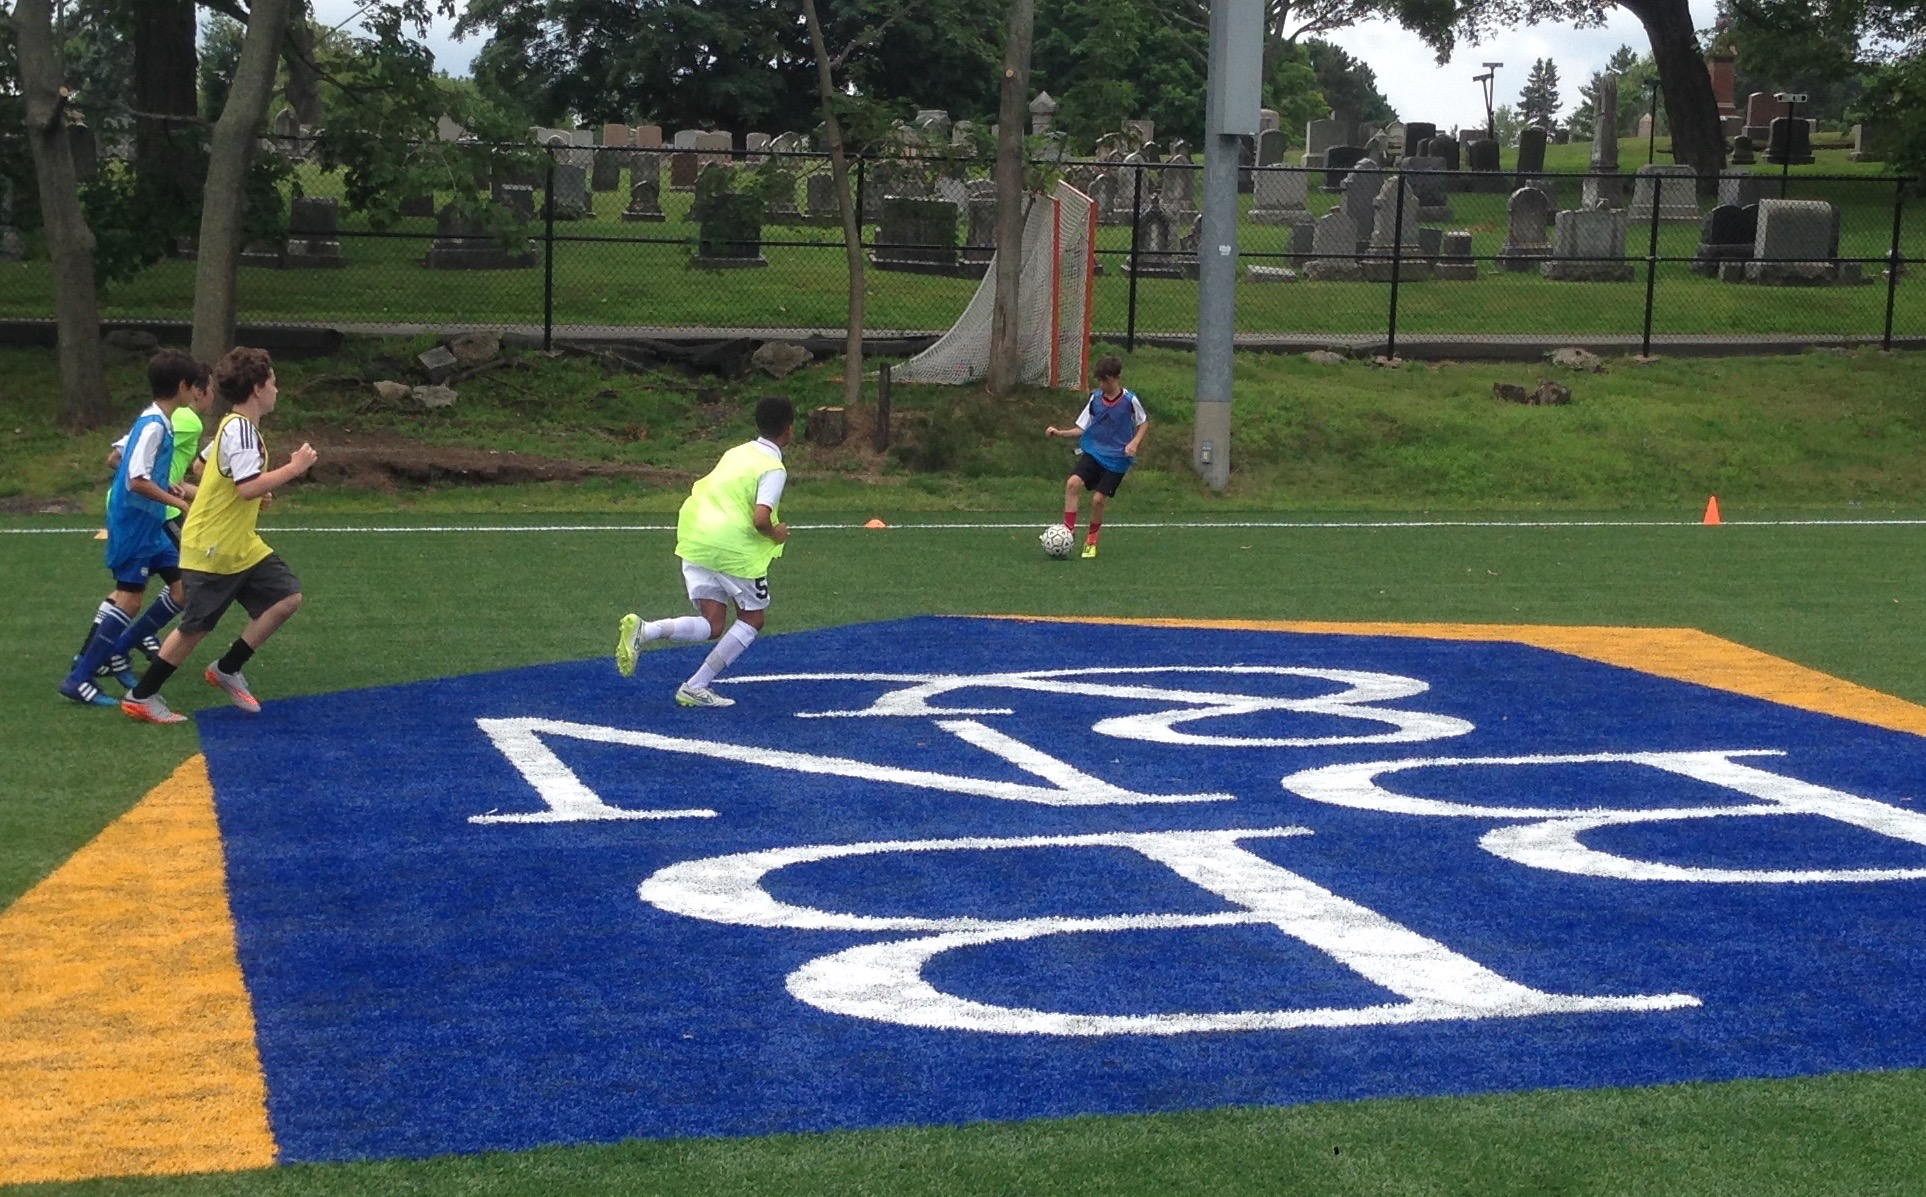 Summer Program - Multi-Sport | Buckingham Browne & Nichols : BB&N : Sports Academy